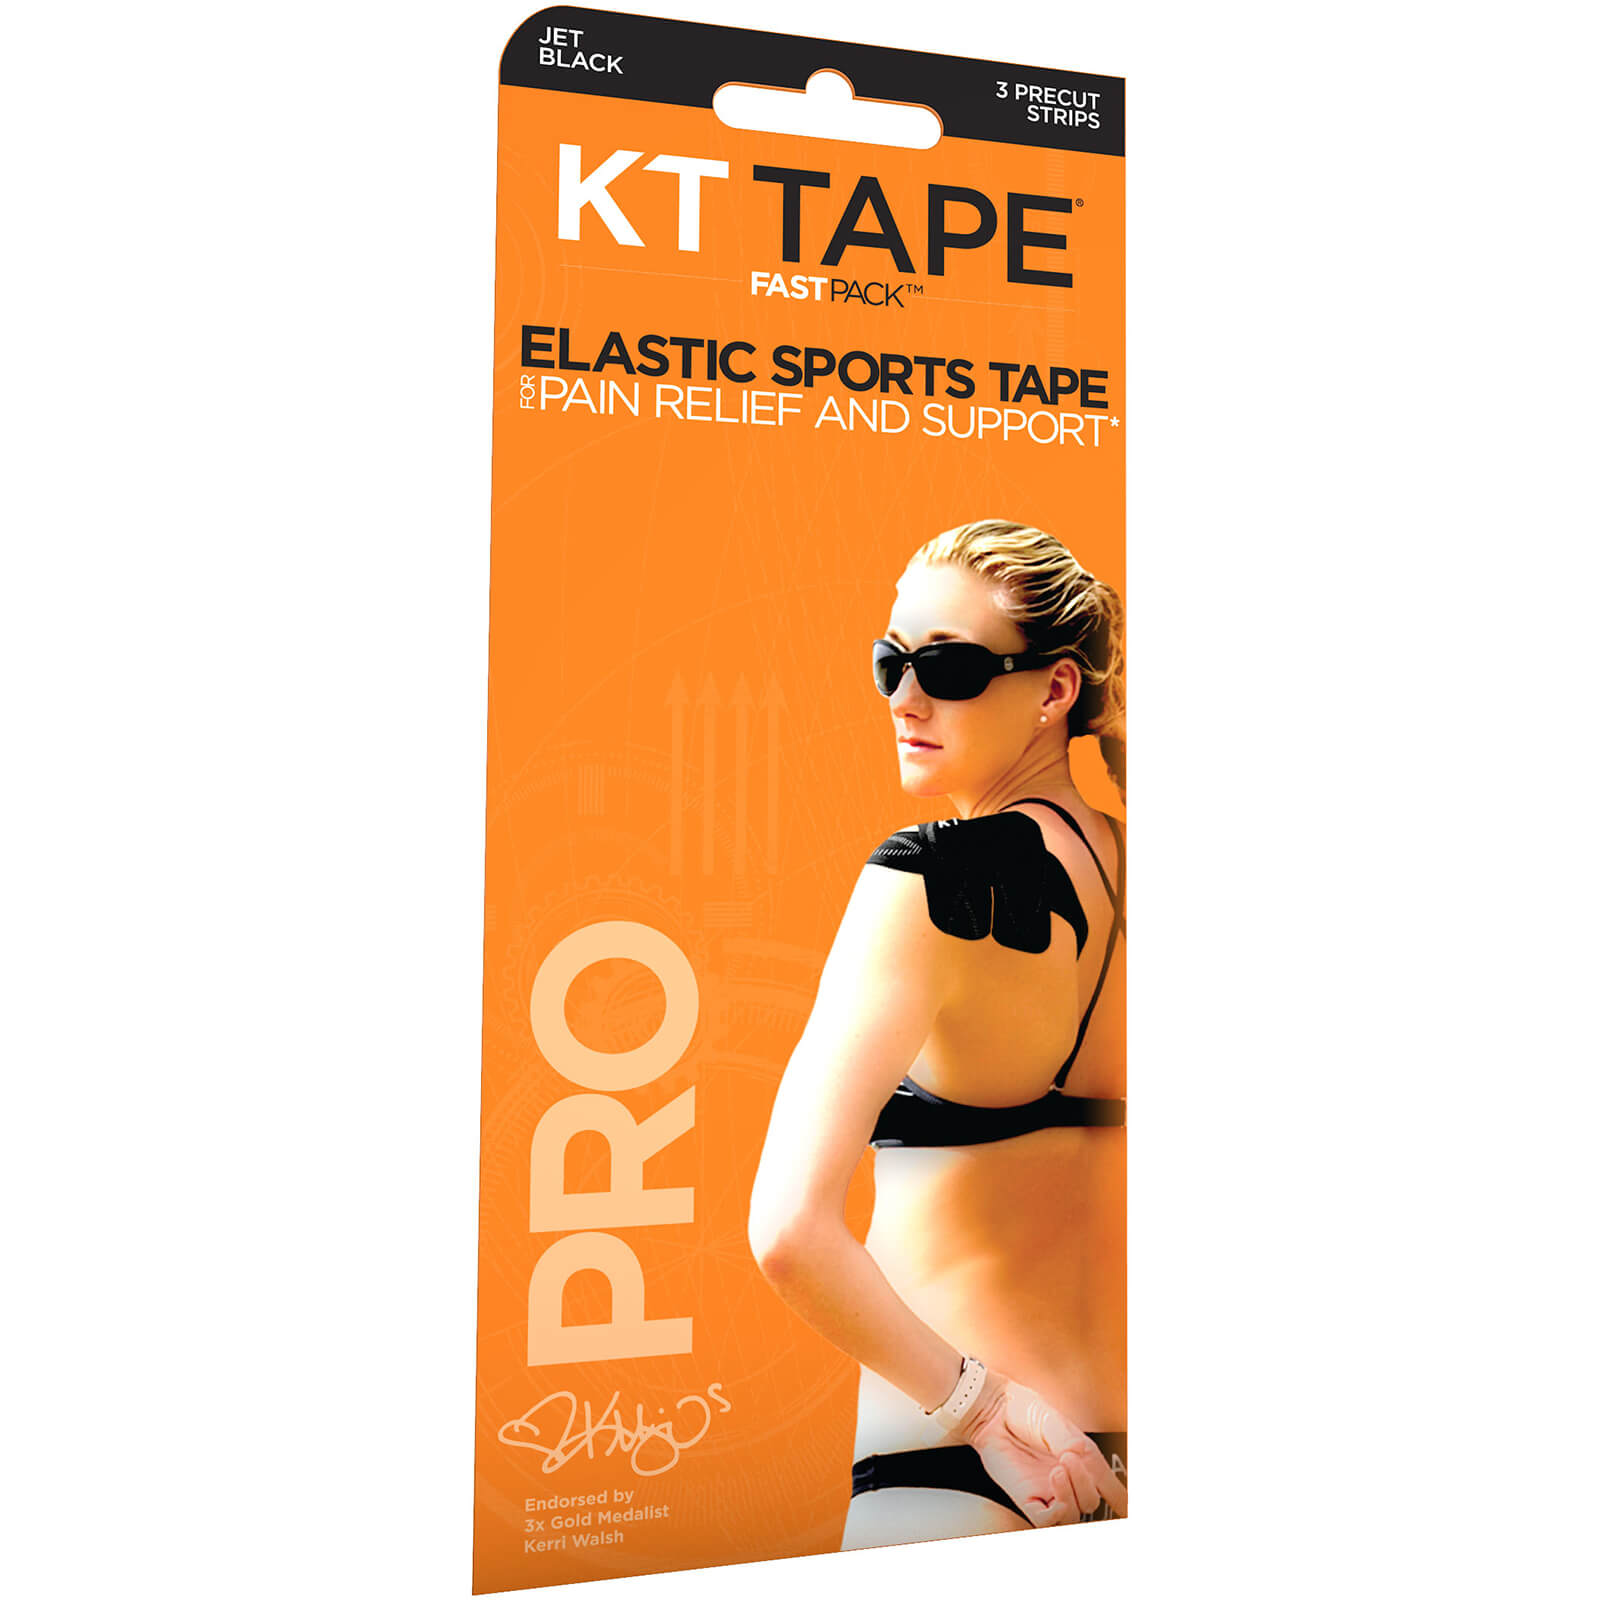 KT Tape Pro Synthetic Strips - 3 Strips - Jet Black